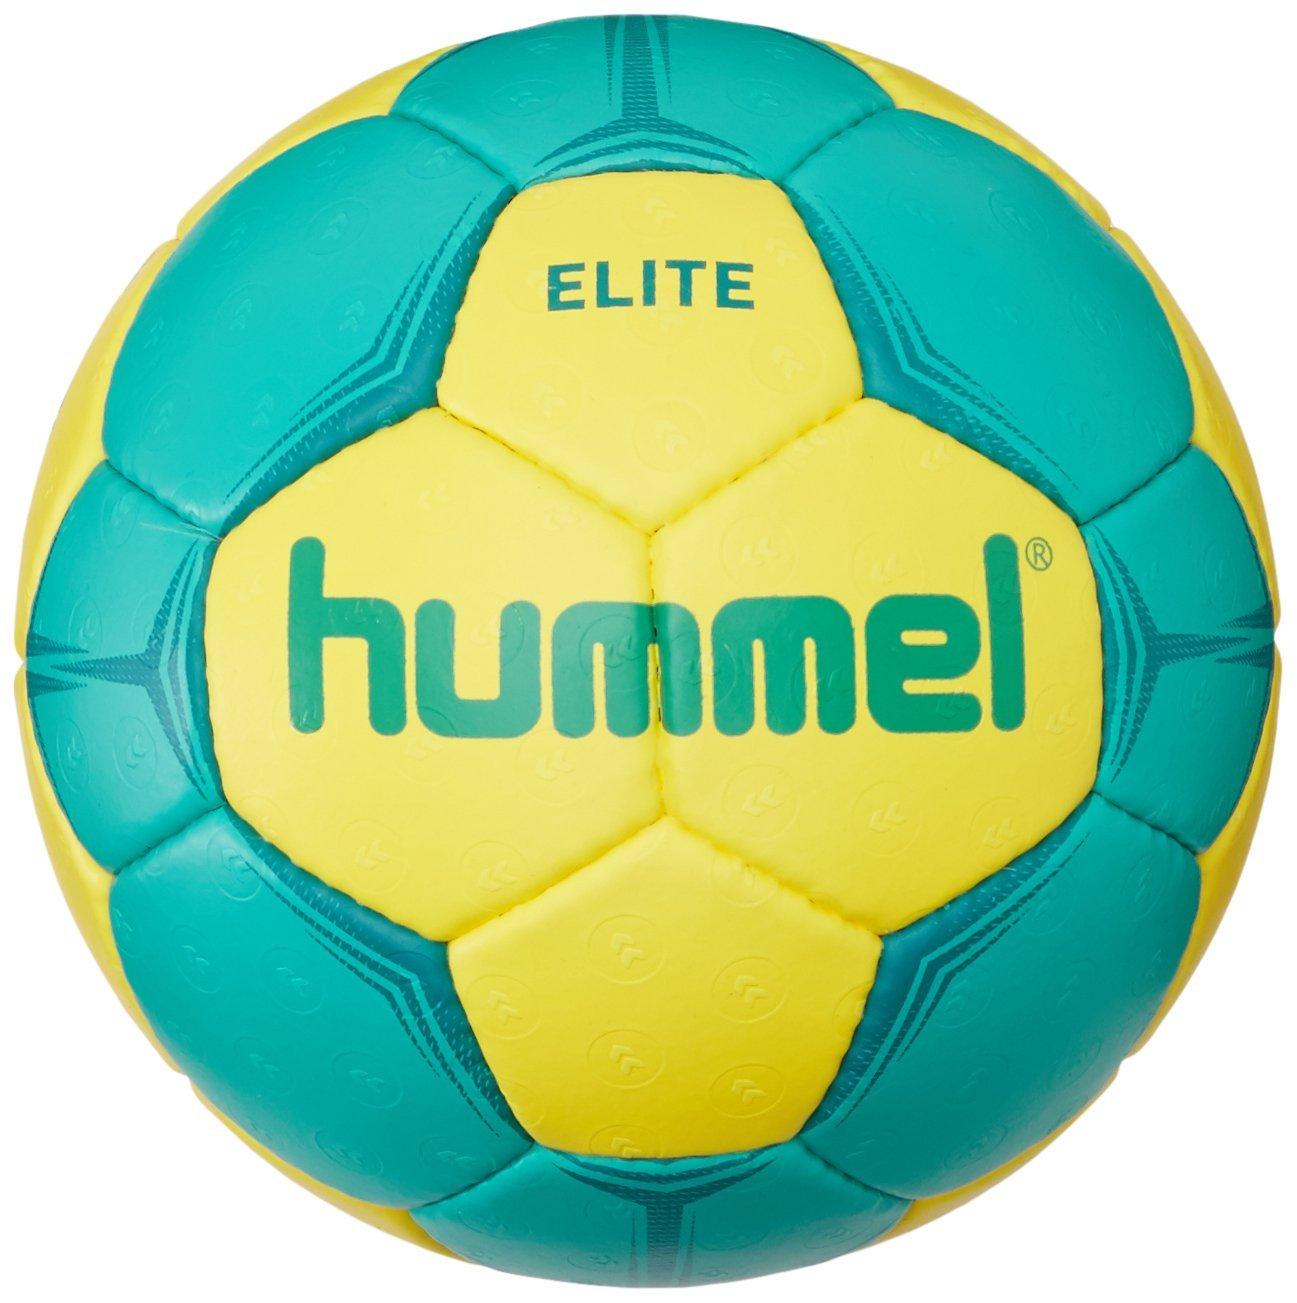 Preistipp: Elite (Hummel)